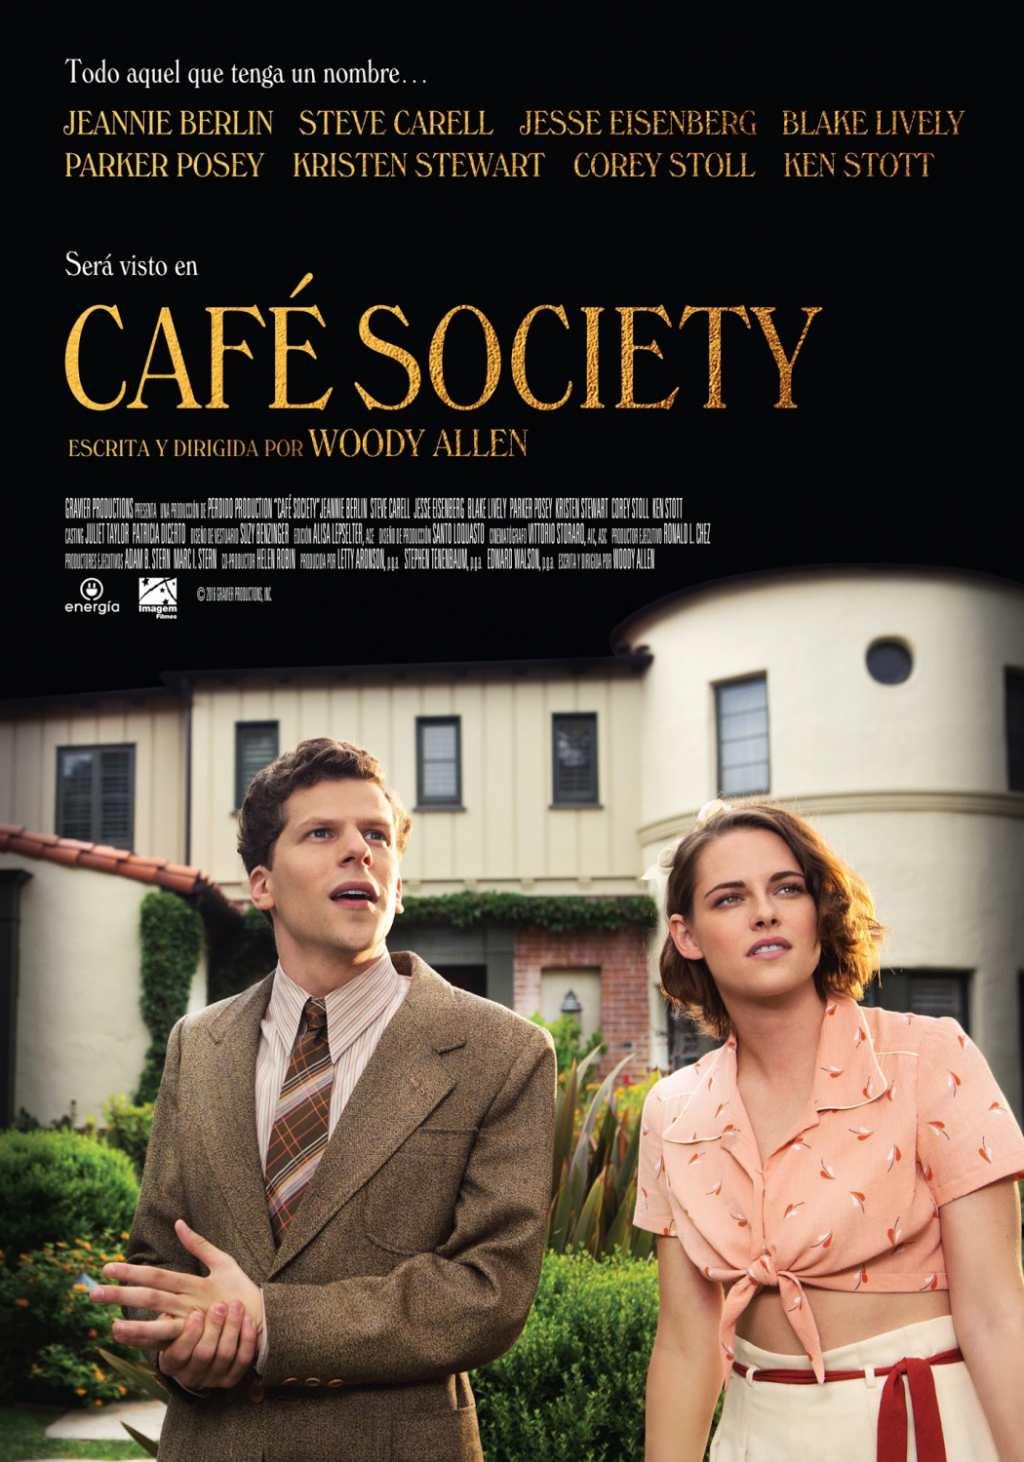 cafe society turkce altyazili filmini izle 968